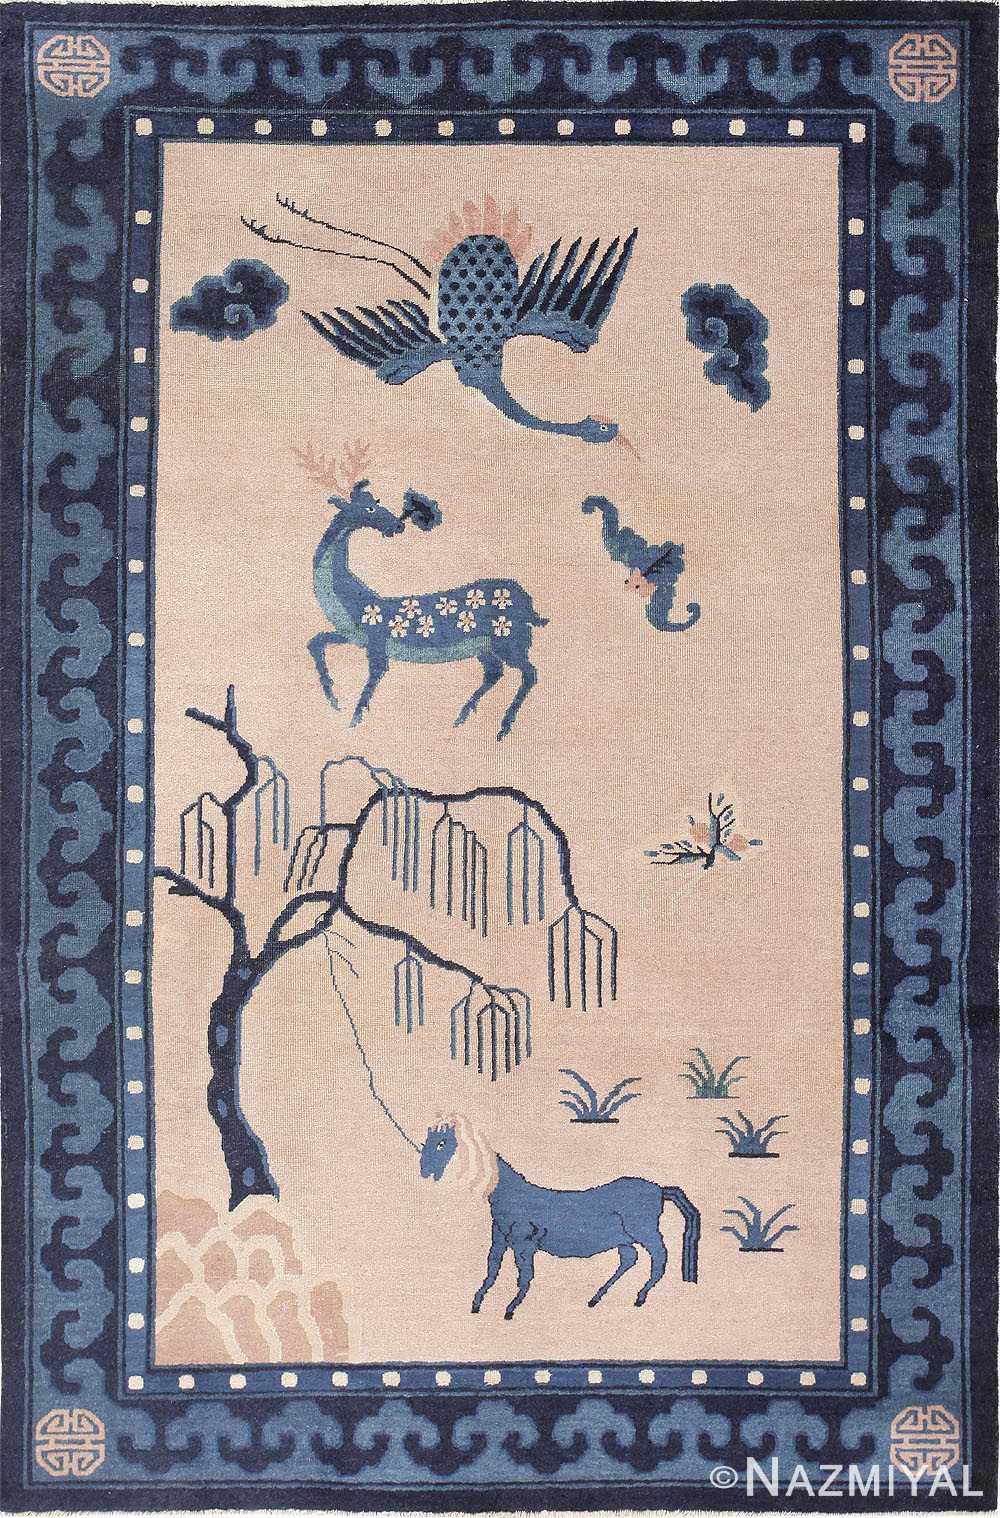 Beautiful Antique Chinese Rug 47558 by Nazmiyal